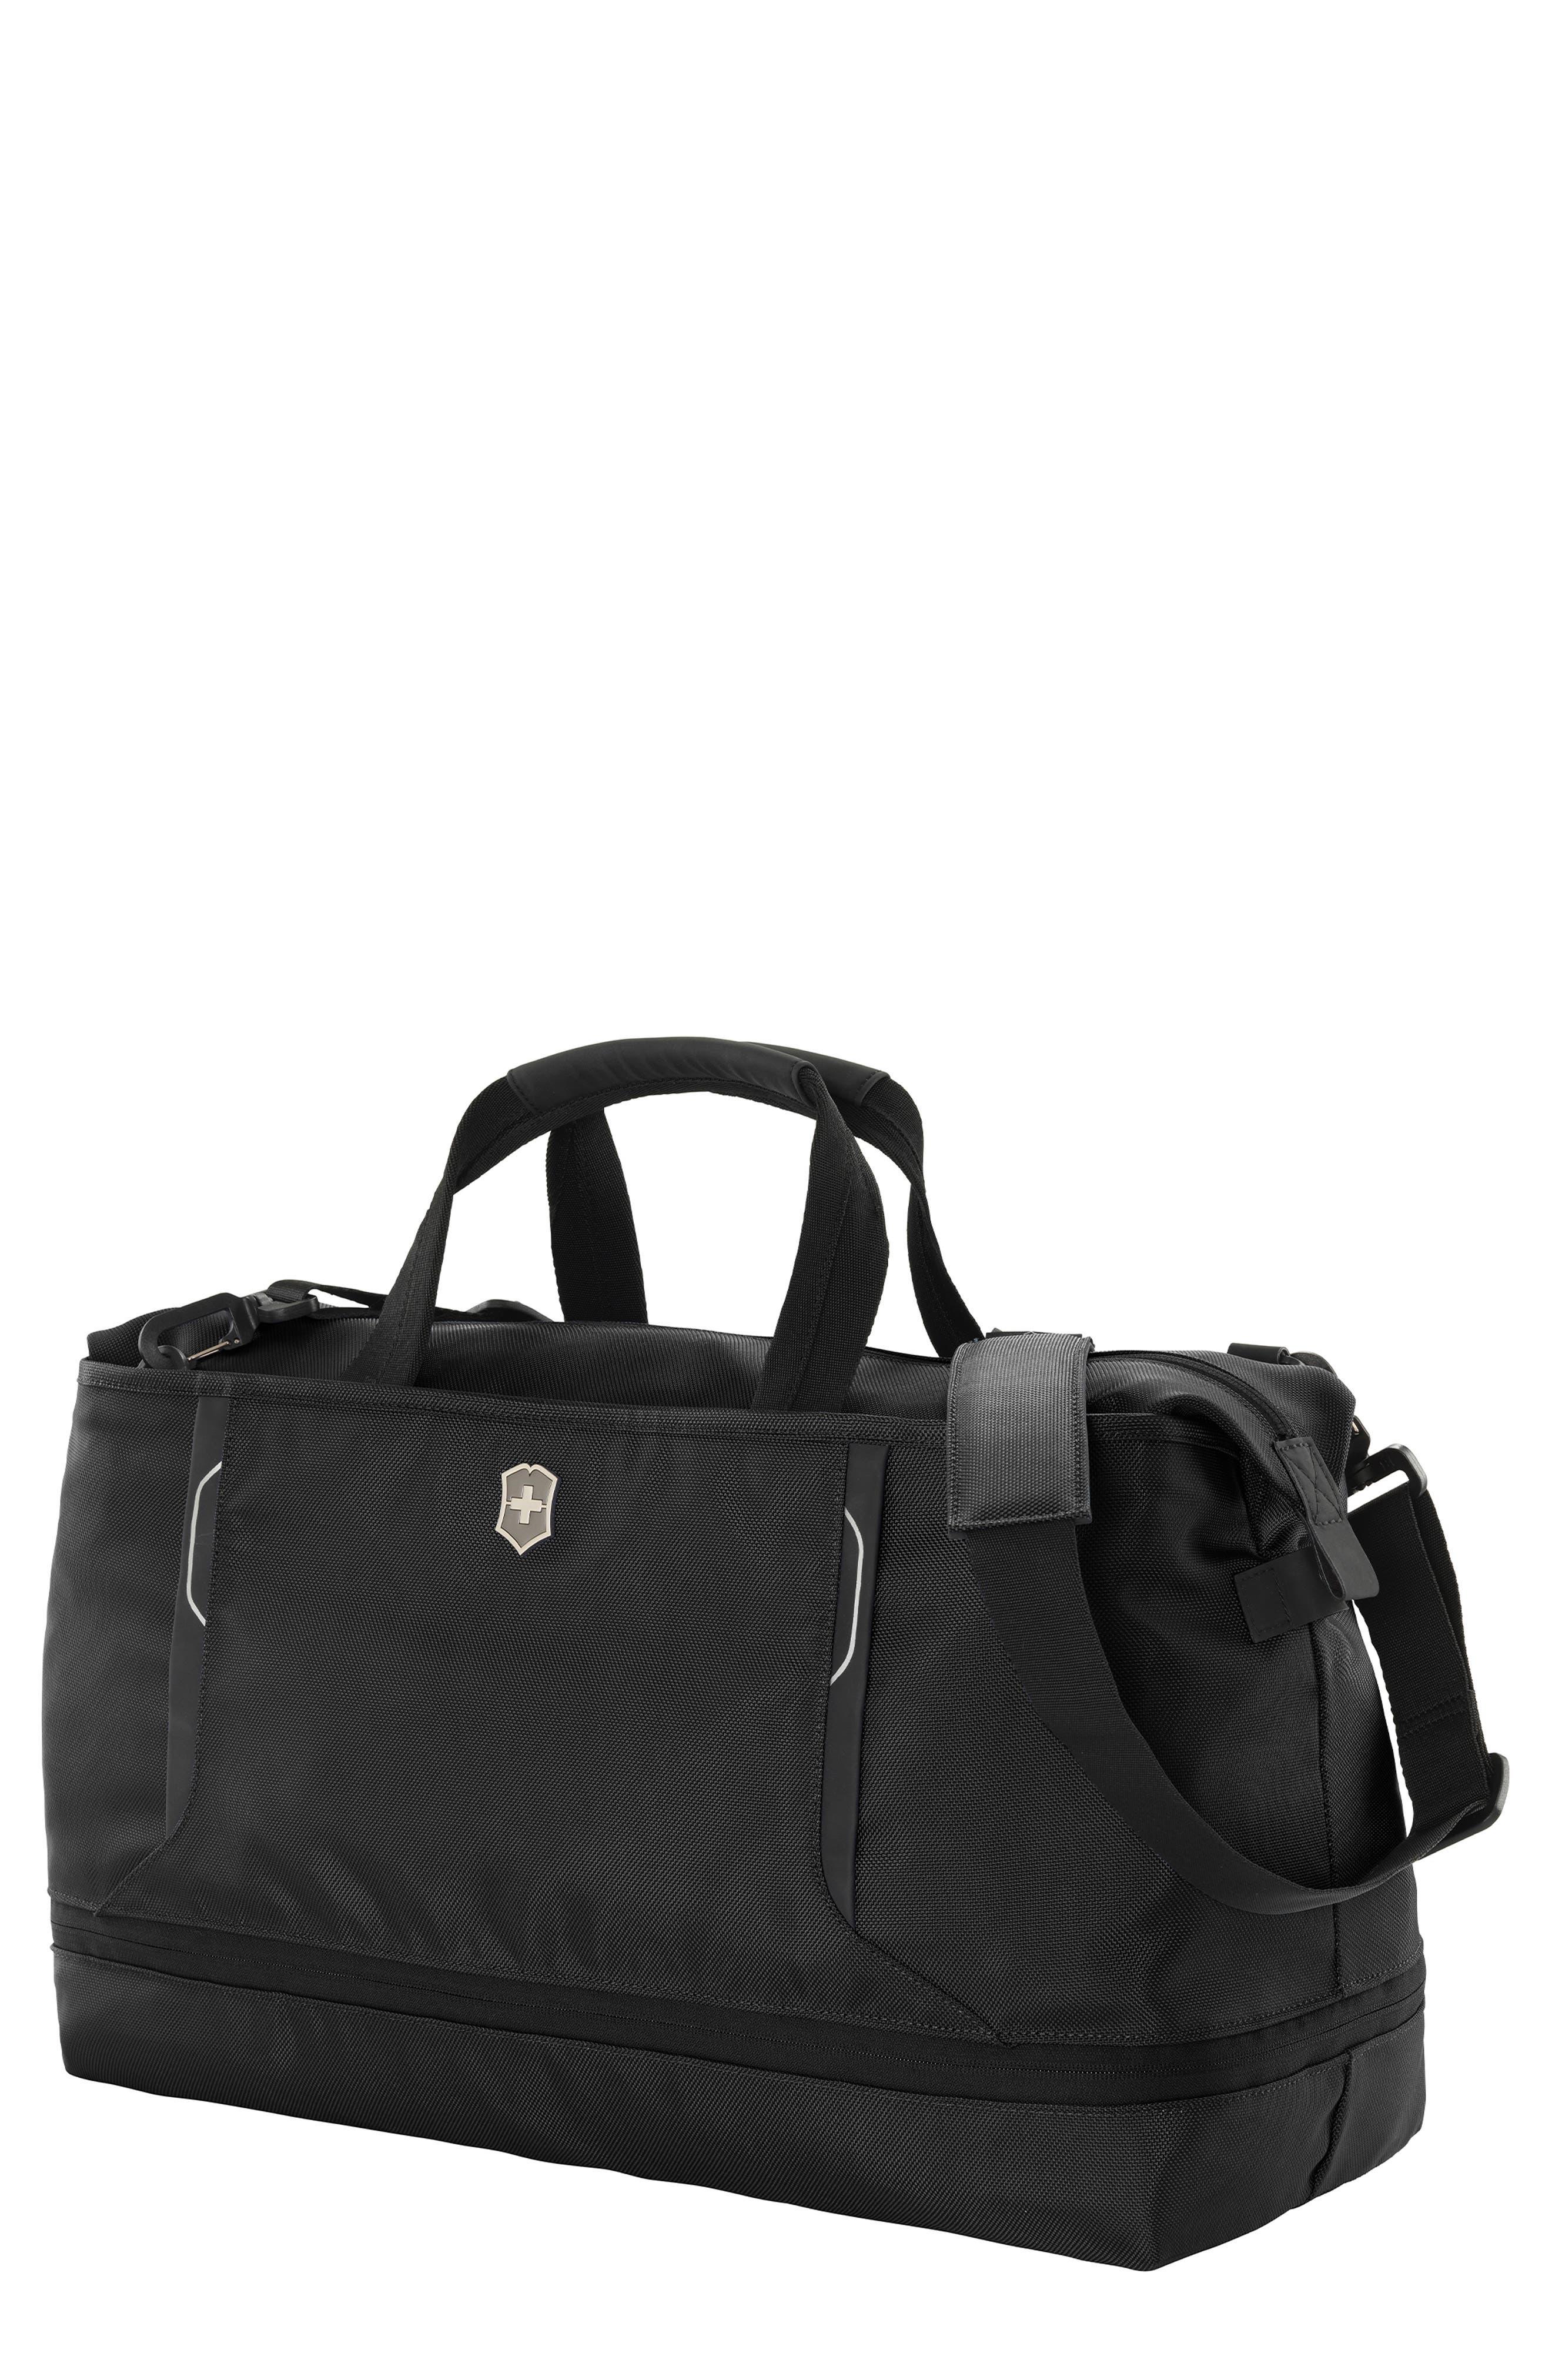 Men's Victorinox Swiss Army Werks 6.0 Xl Duffle Bag